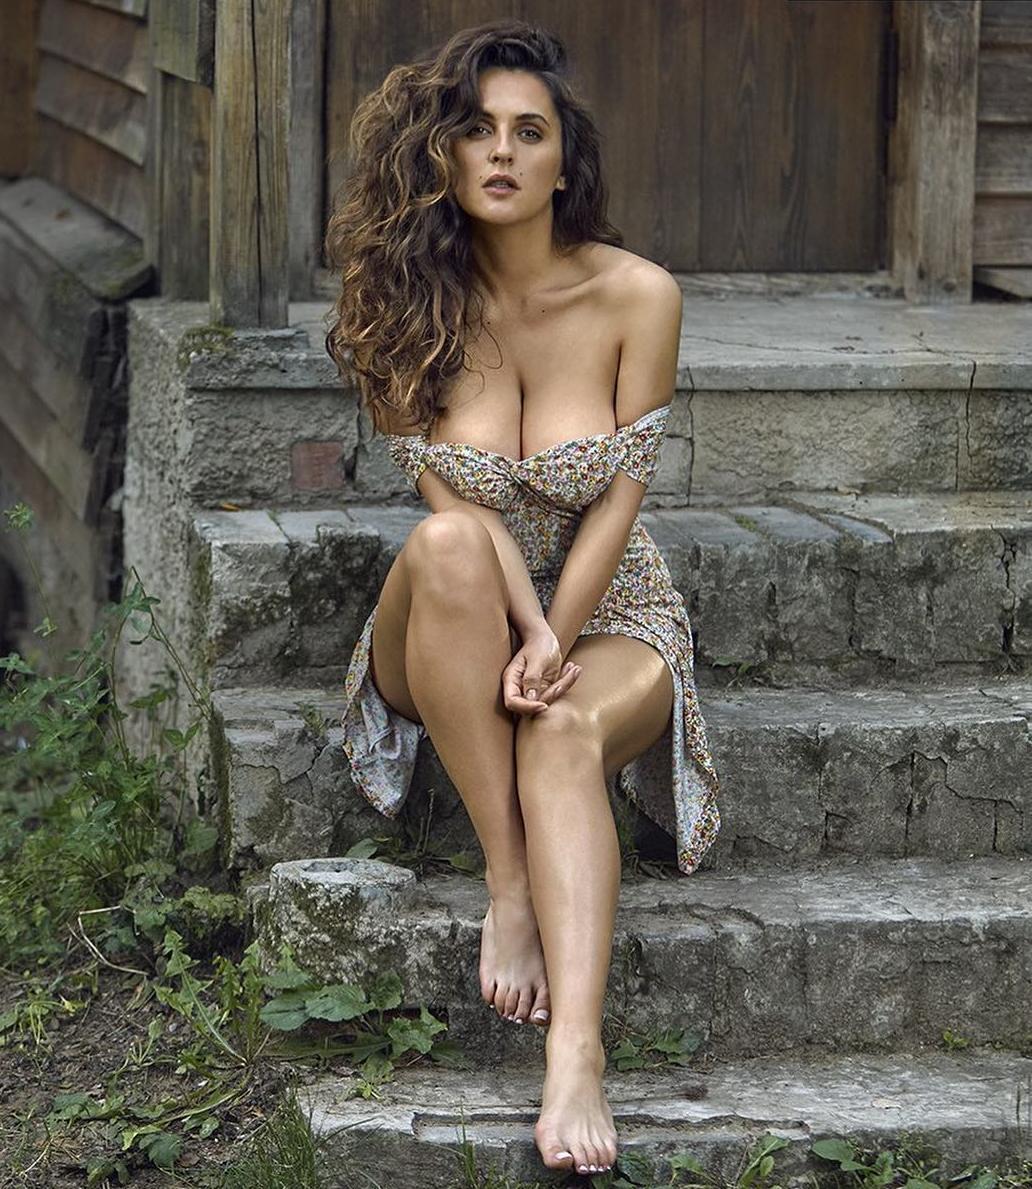 Мария Шумакова фото плейбой